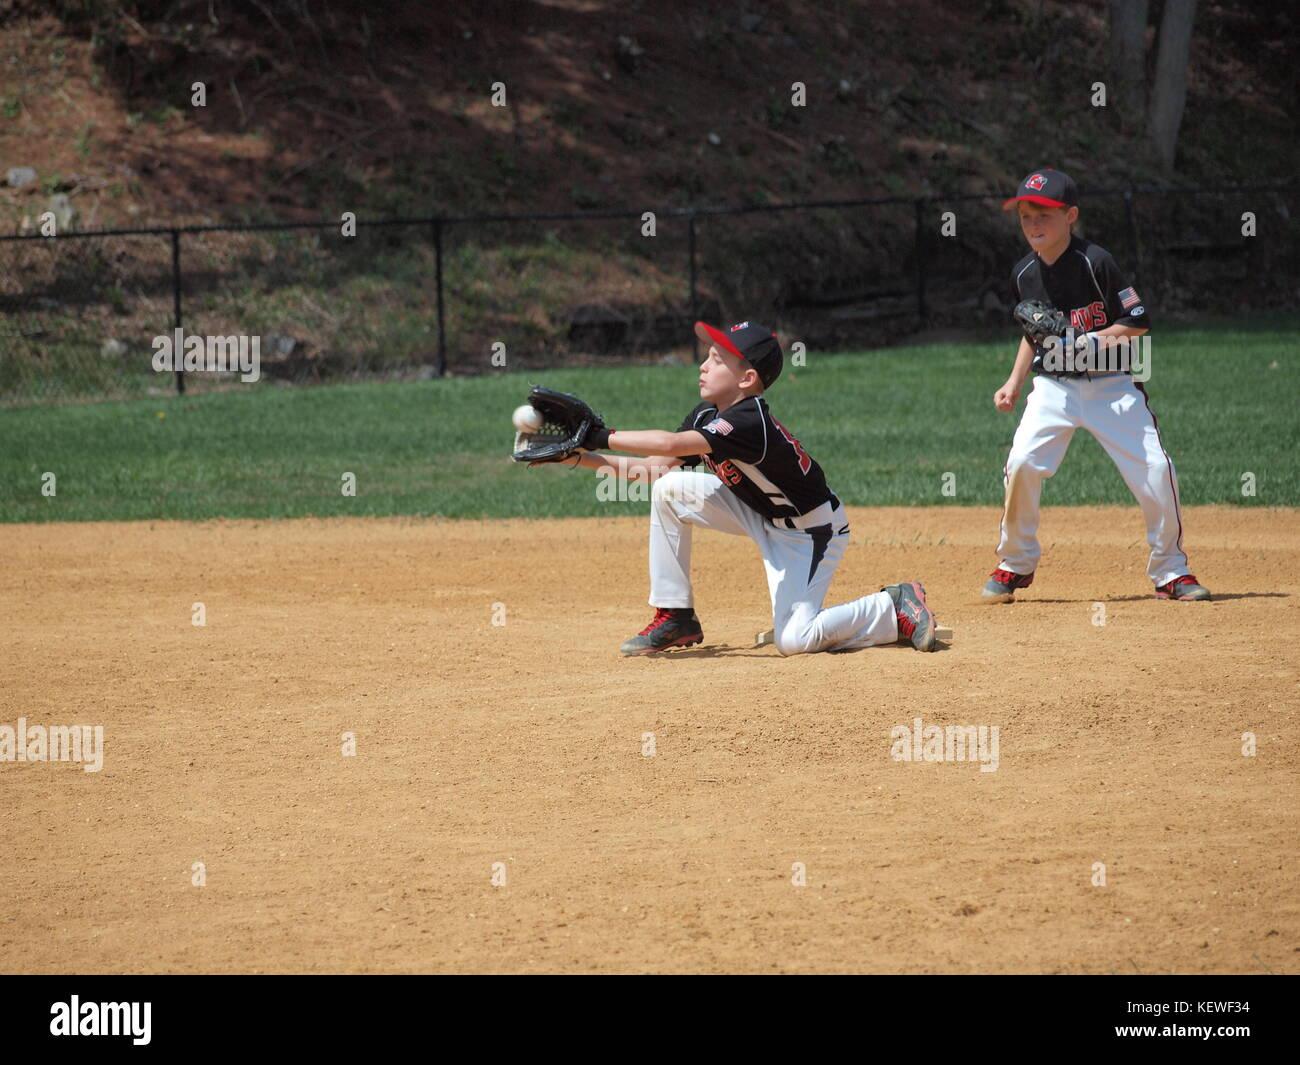 Der kleine Liga-Feldspieler stoppt den Ball am heißen Sommertag. Stockfoto